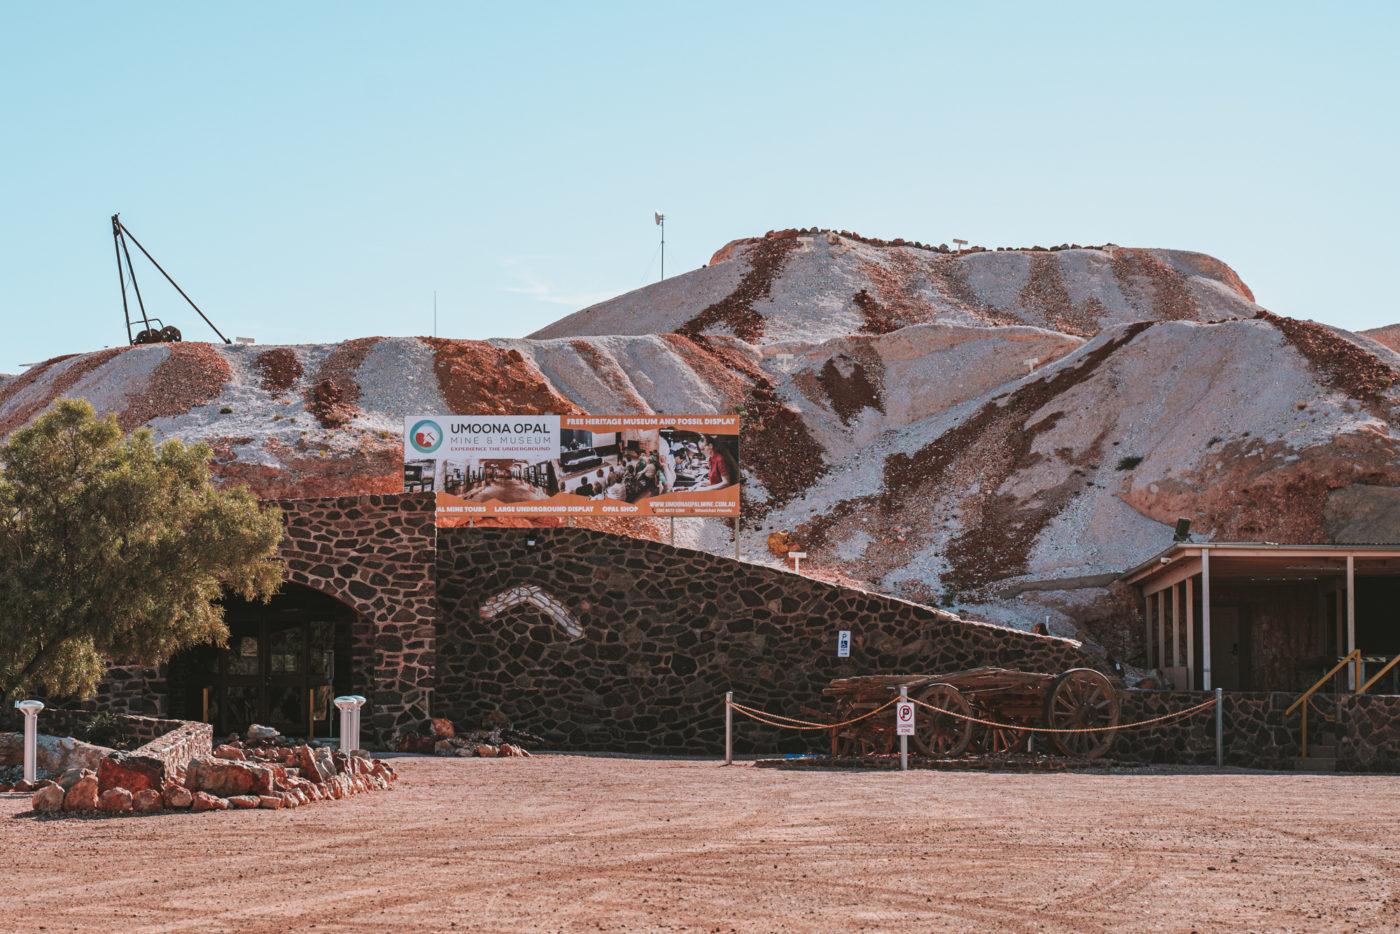 Umoona Opal Mine and Museum, Coober Pedy